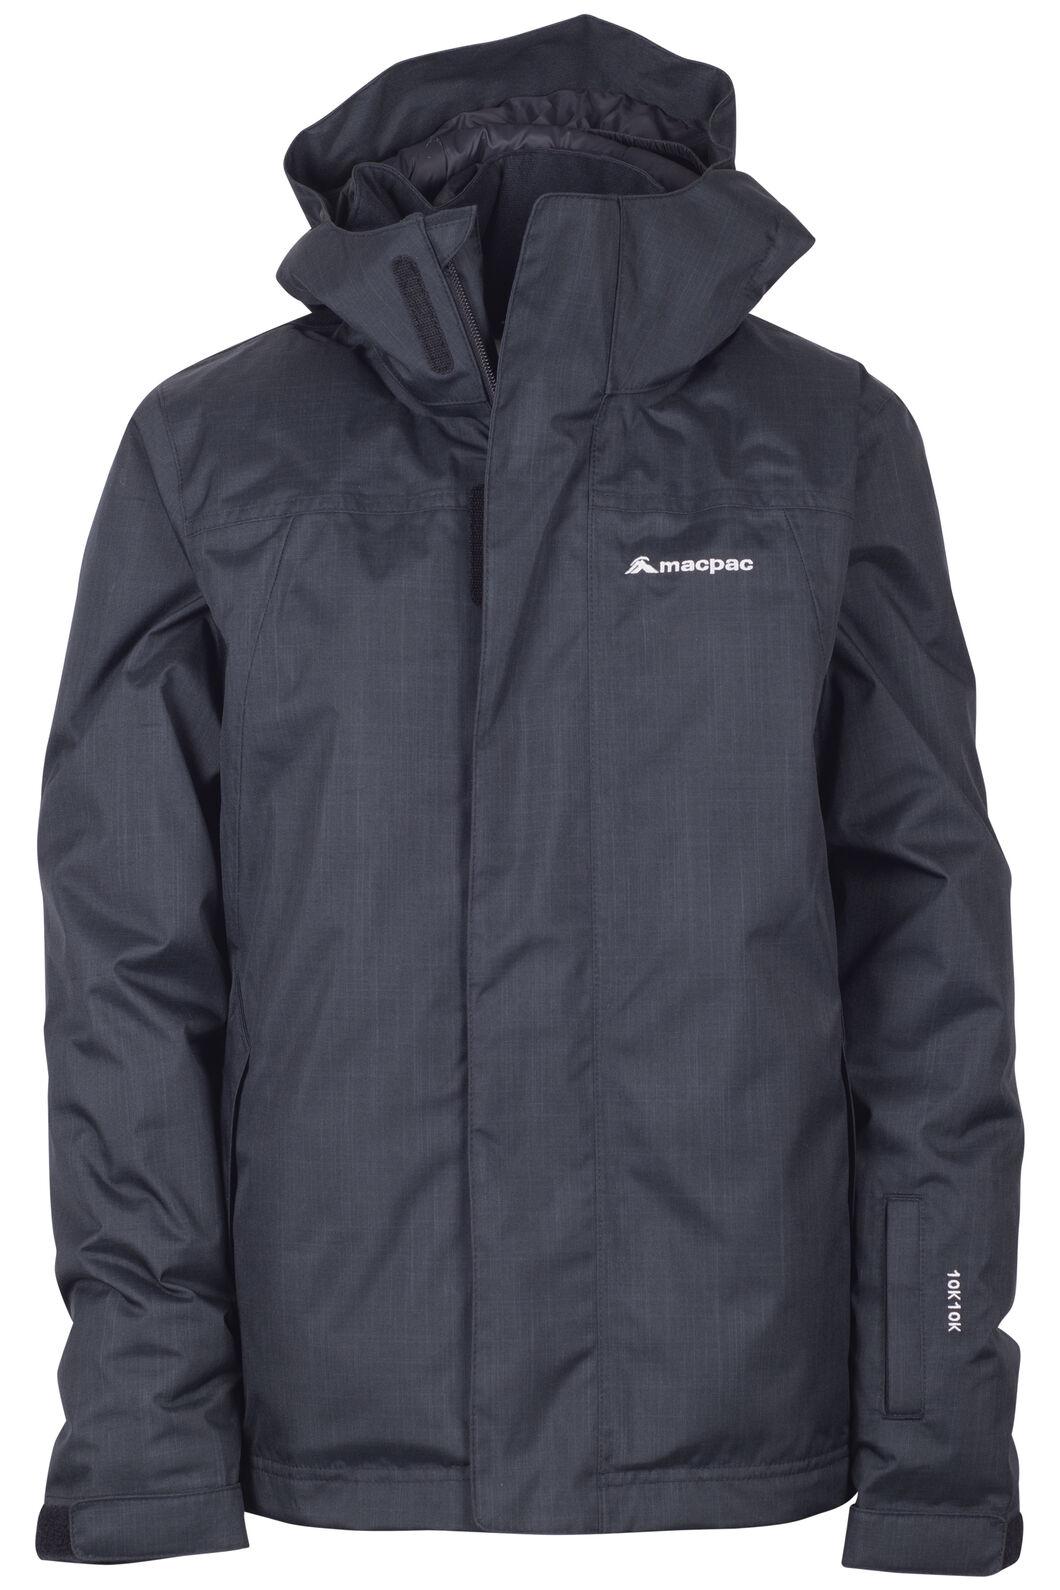 Macpac Spree Ski Jacket - Kids', Black, hi-res